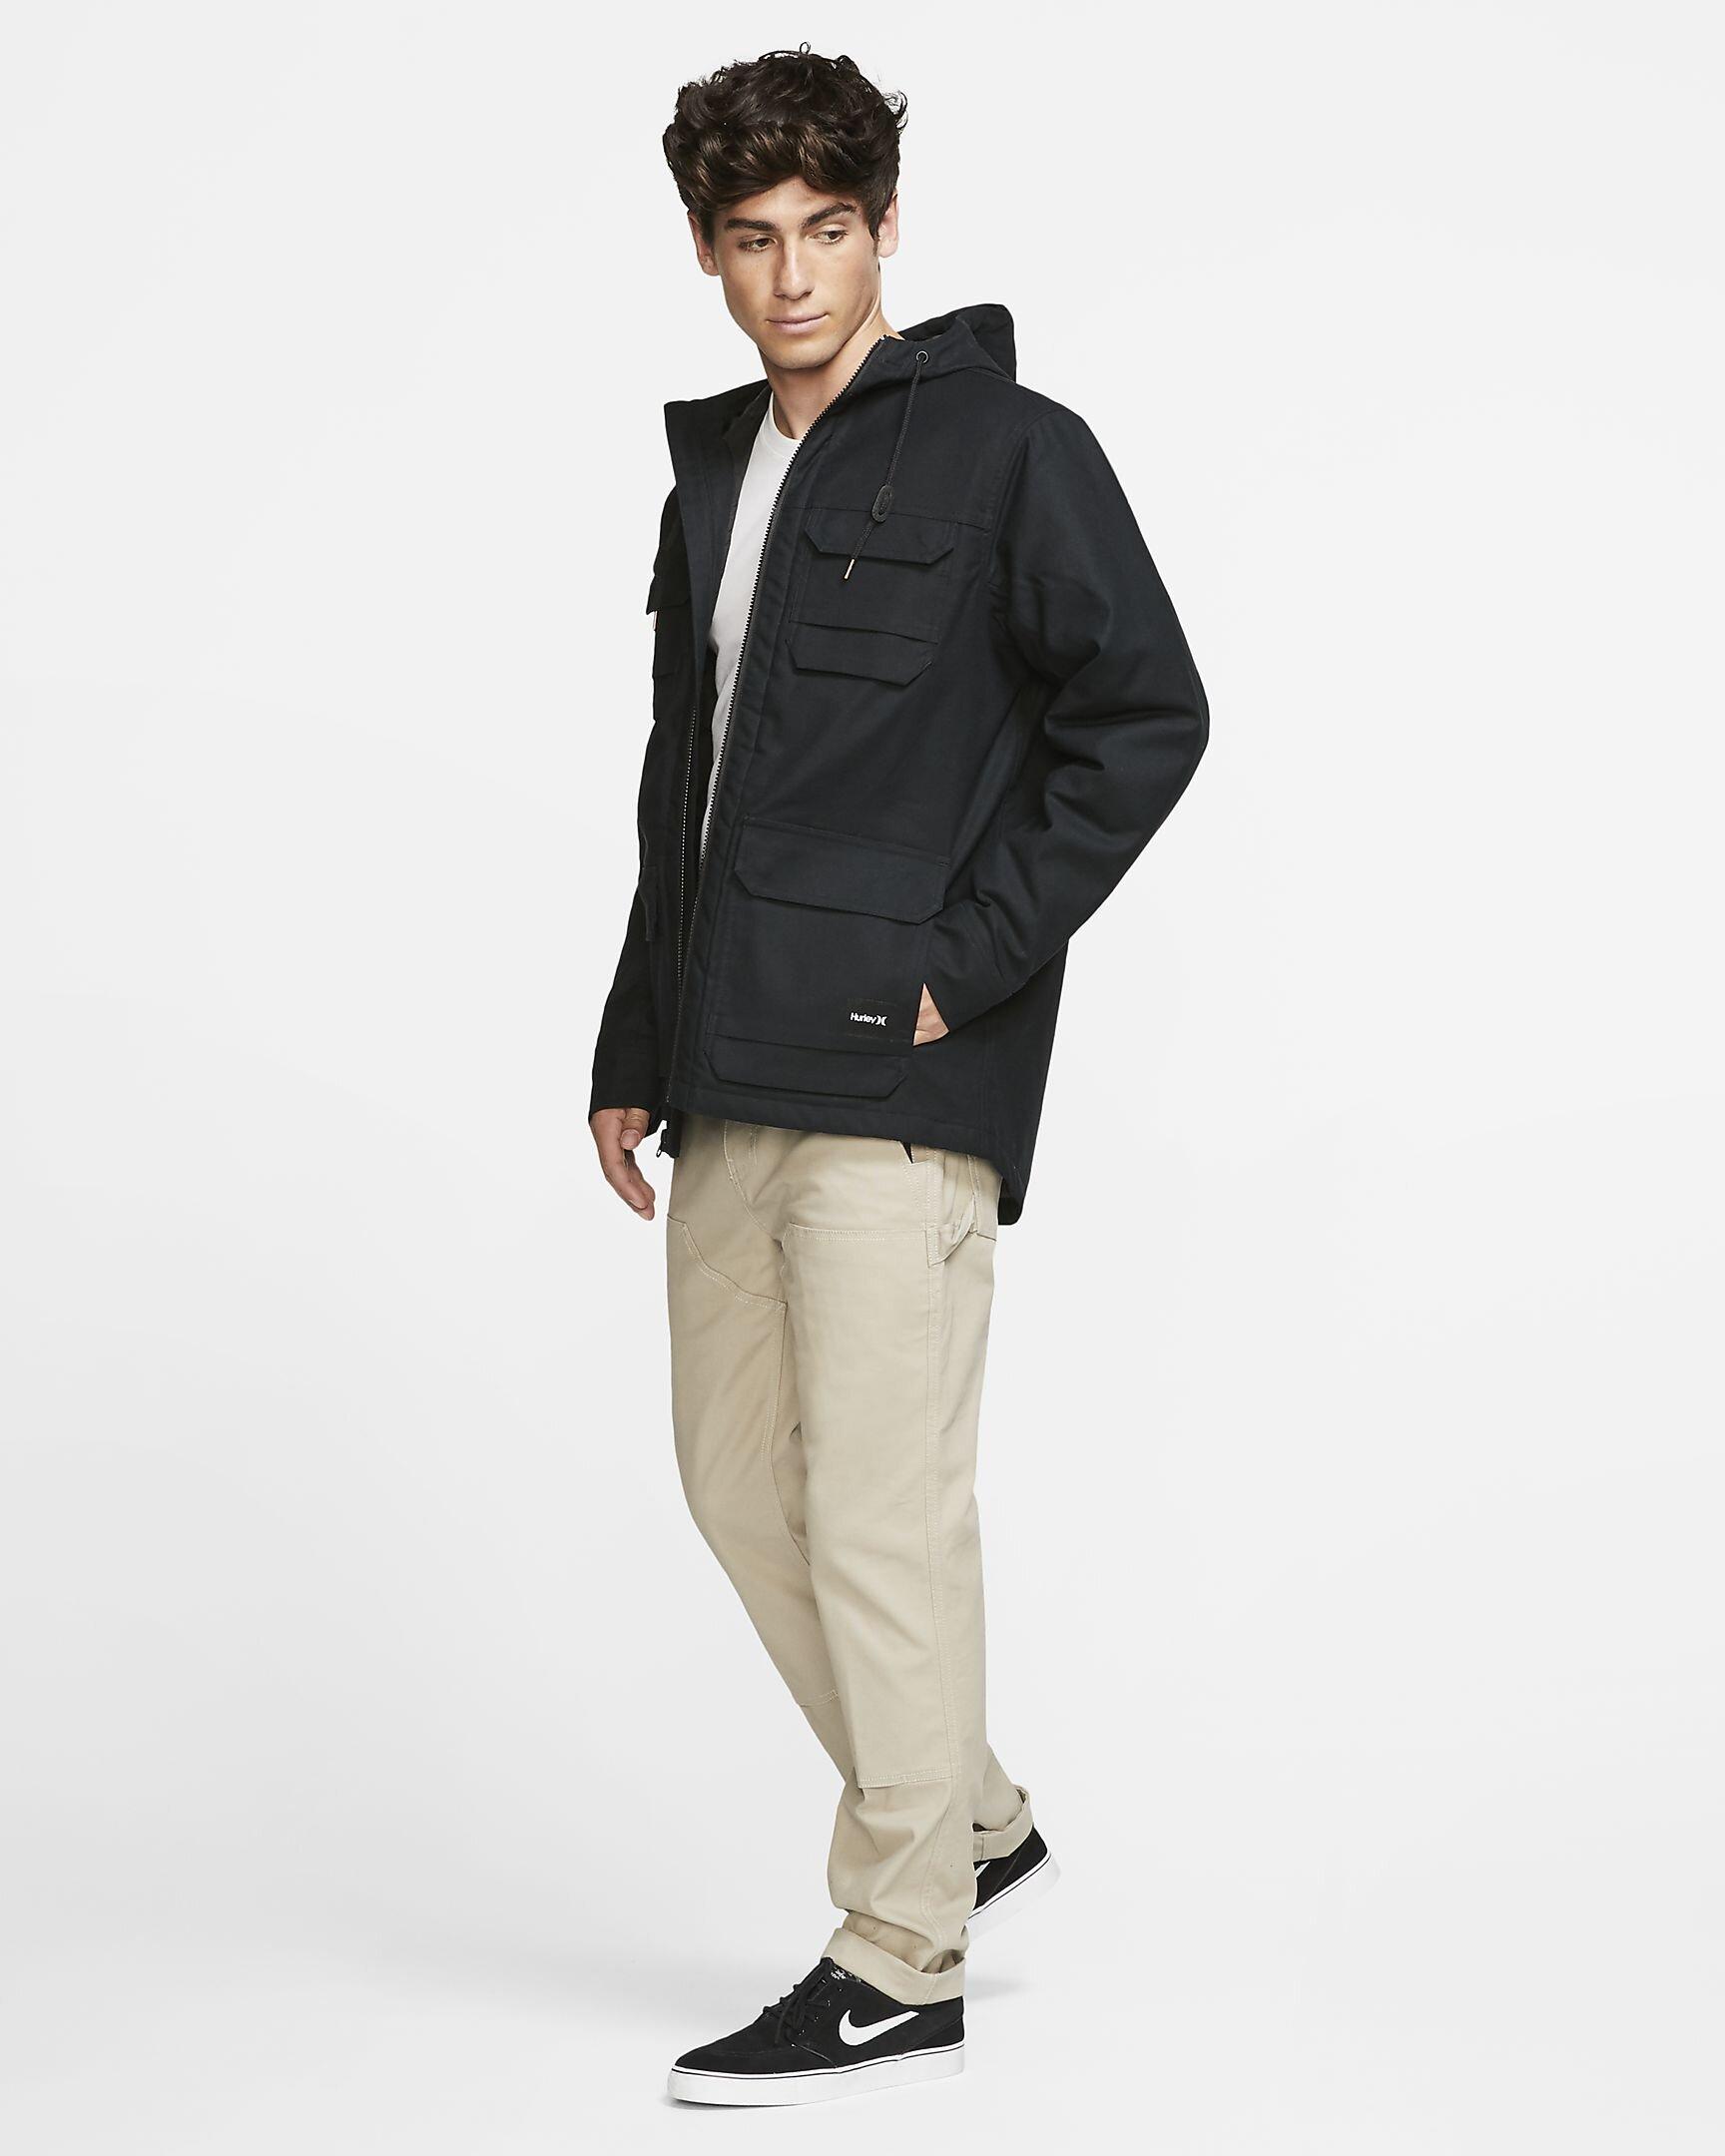 hurley-m65-mens-jacket-3229Xq.jpg